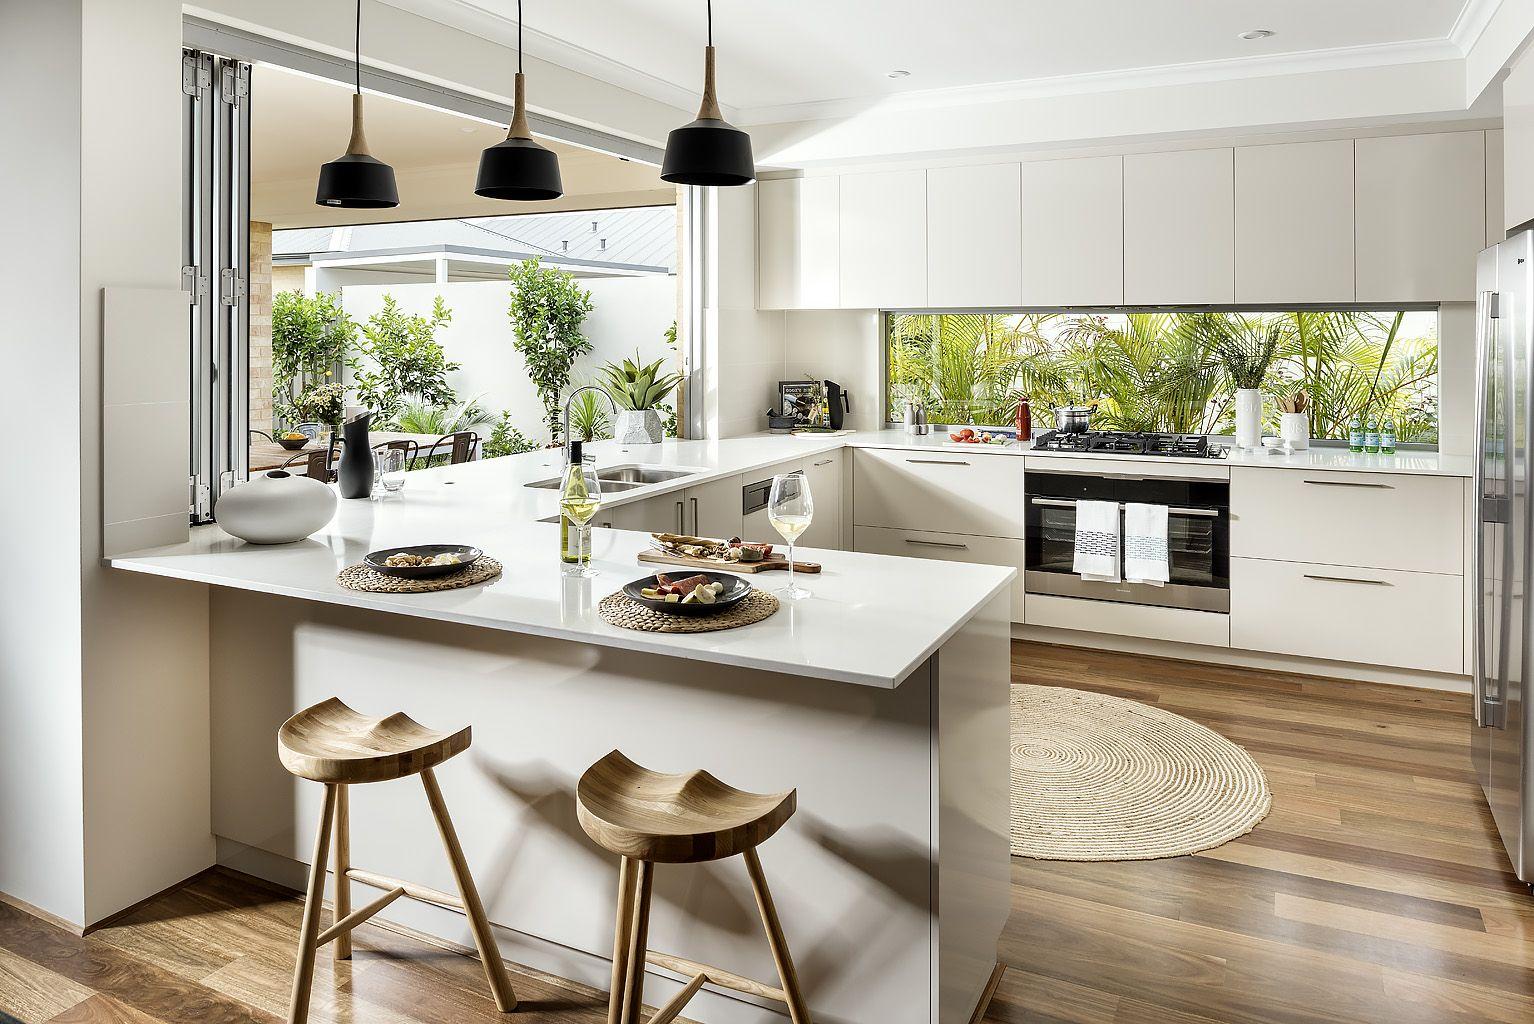 White Modern Kitchen With Glass Window Splash Back And Black Pendant Lights